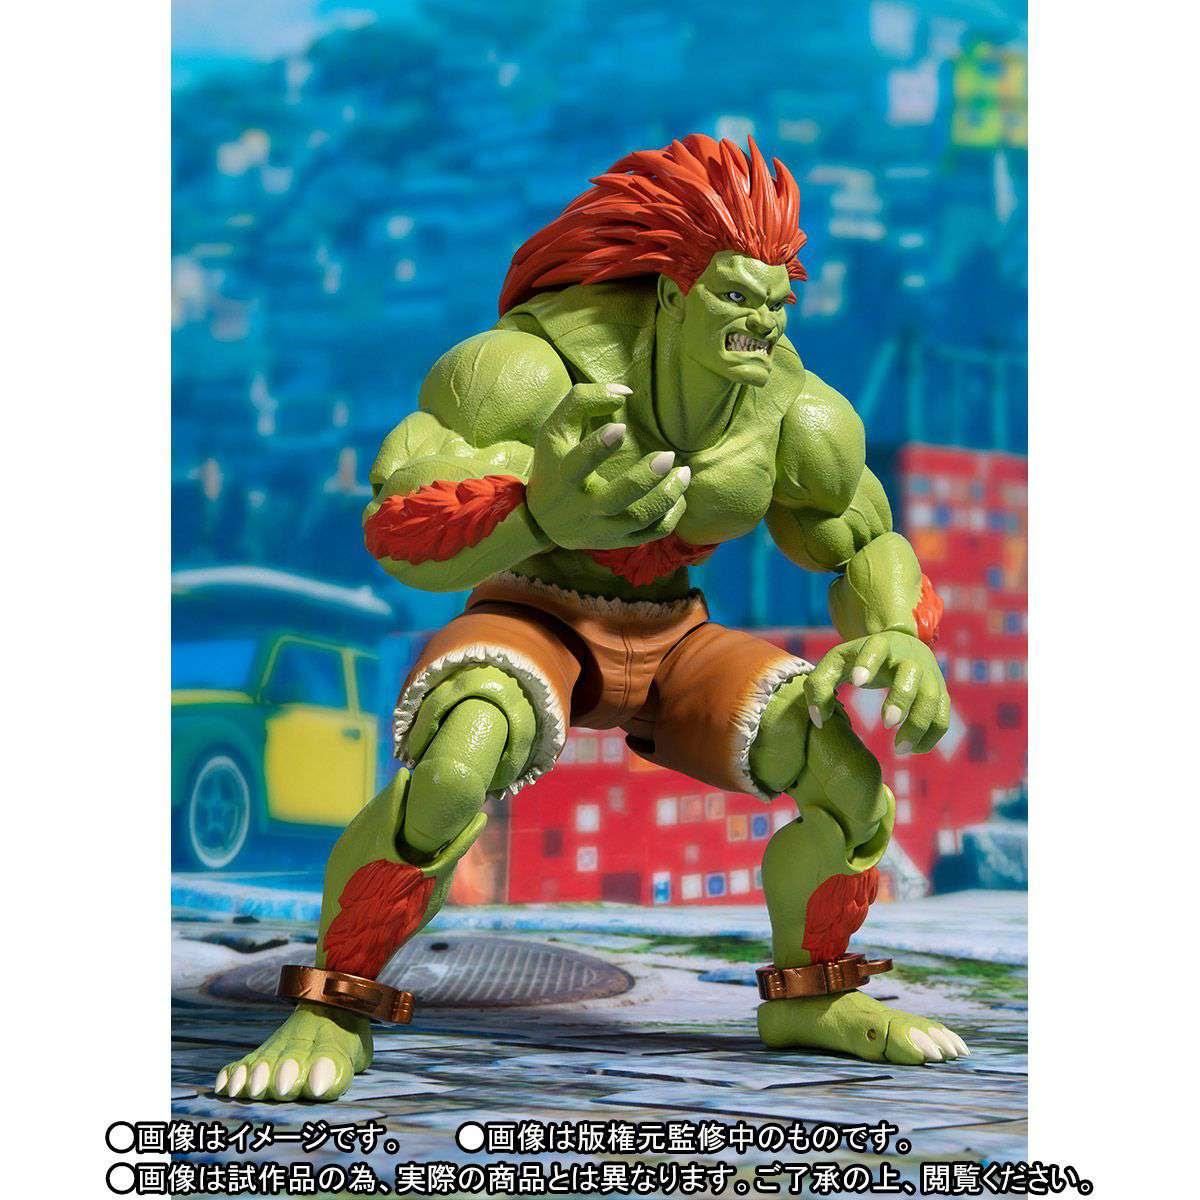 Image of SH Figuarts Street Fighter Blanka